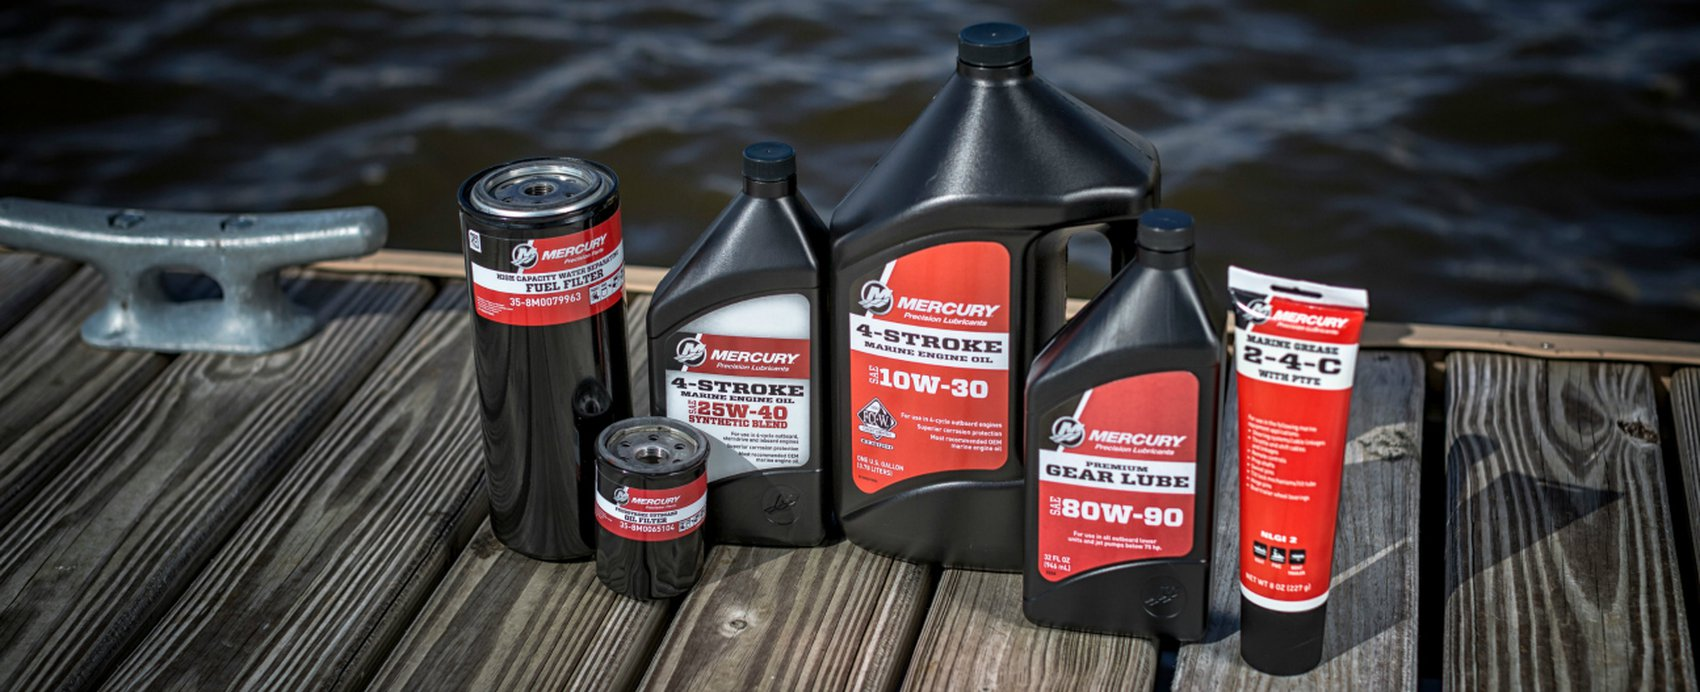 Mercury Dockline | Guide to Precision Oils & Lubricants